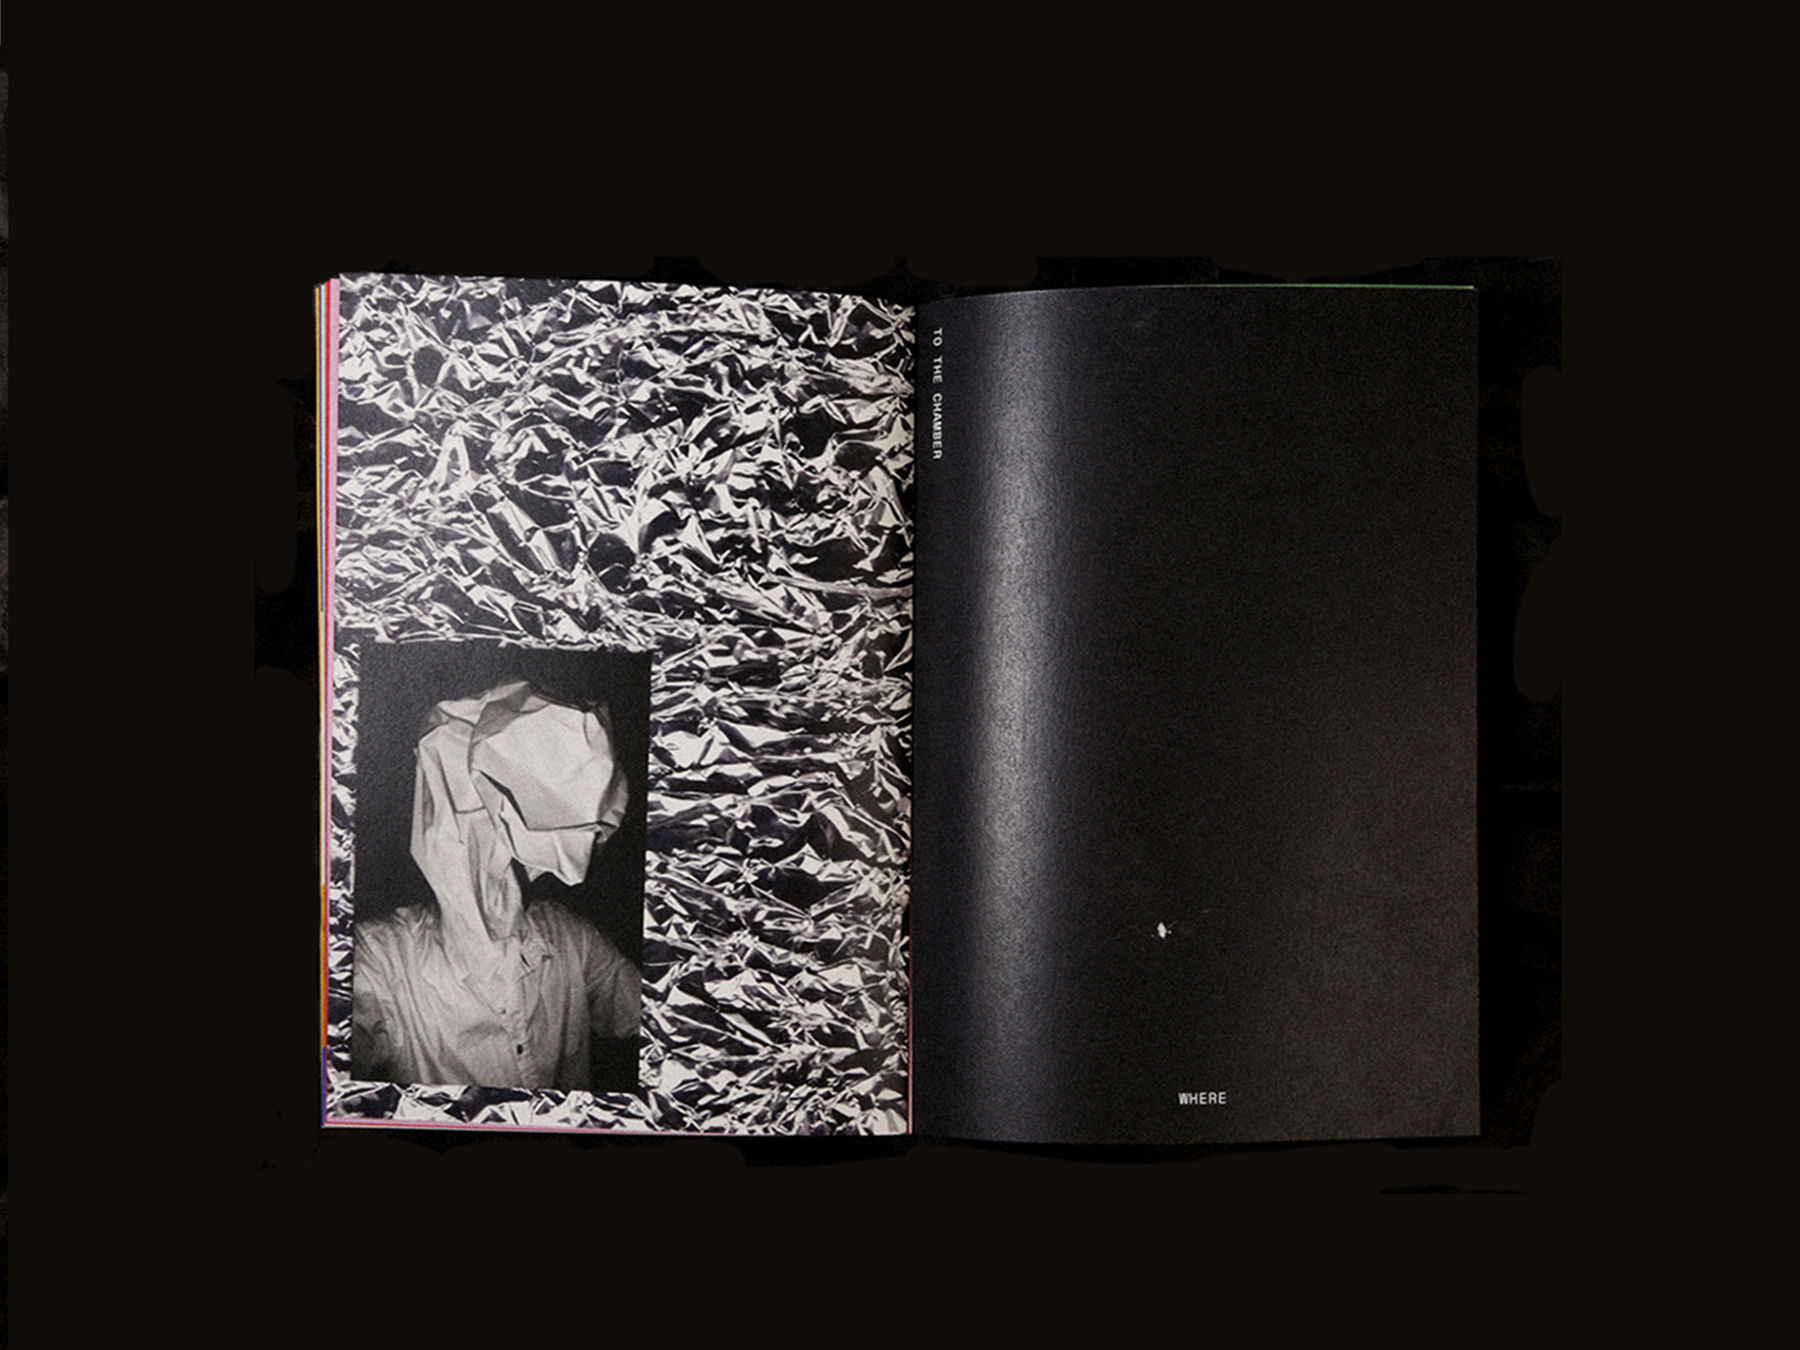 Tomba-Lobos-Witch_15.jpg